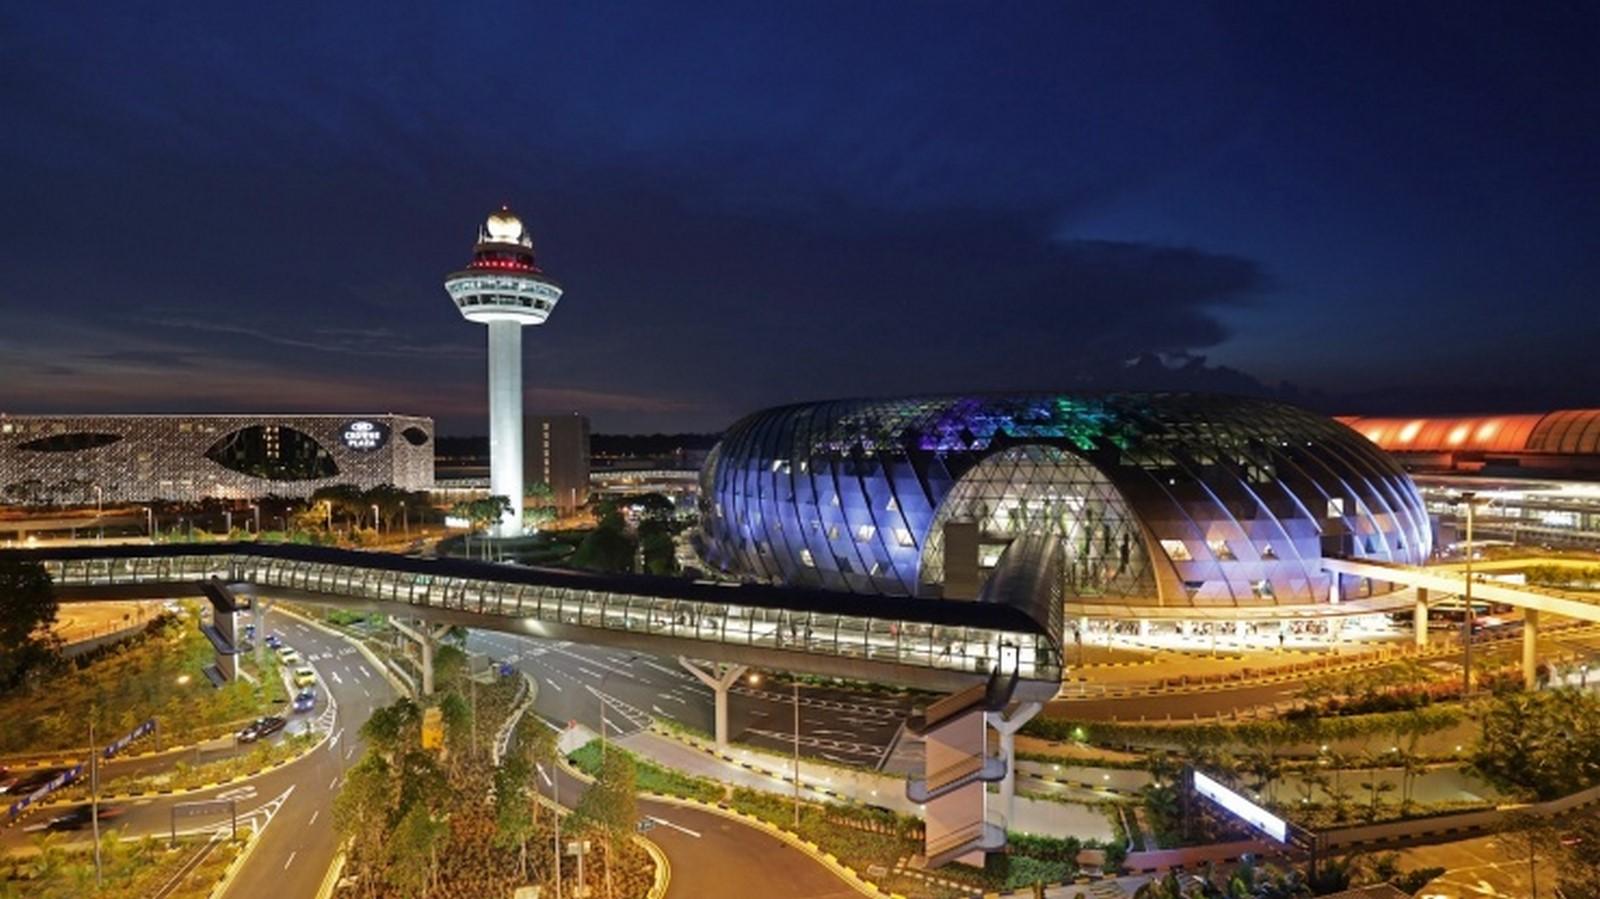 Architecture in Singapore - Jewel Changi Airport - Sheet1